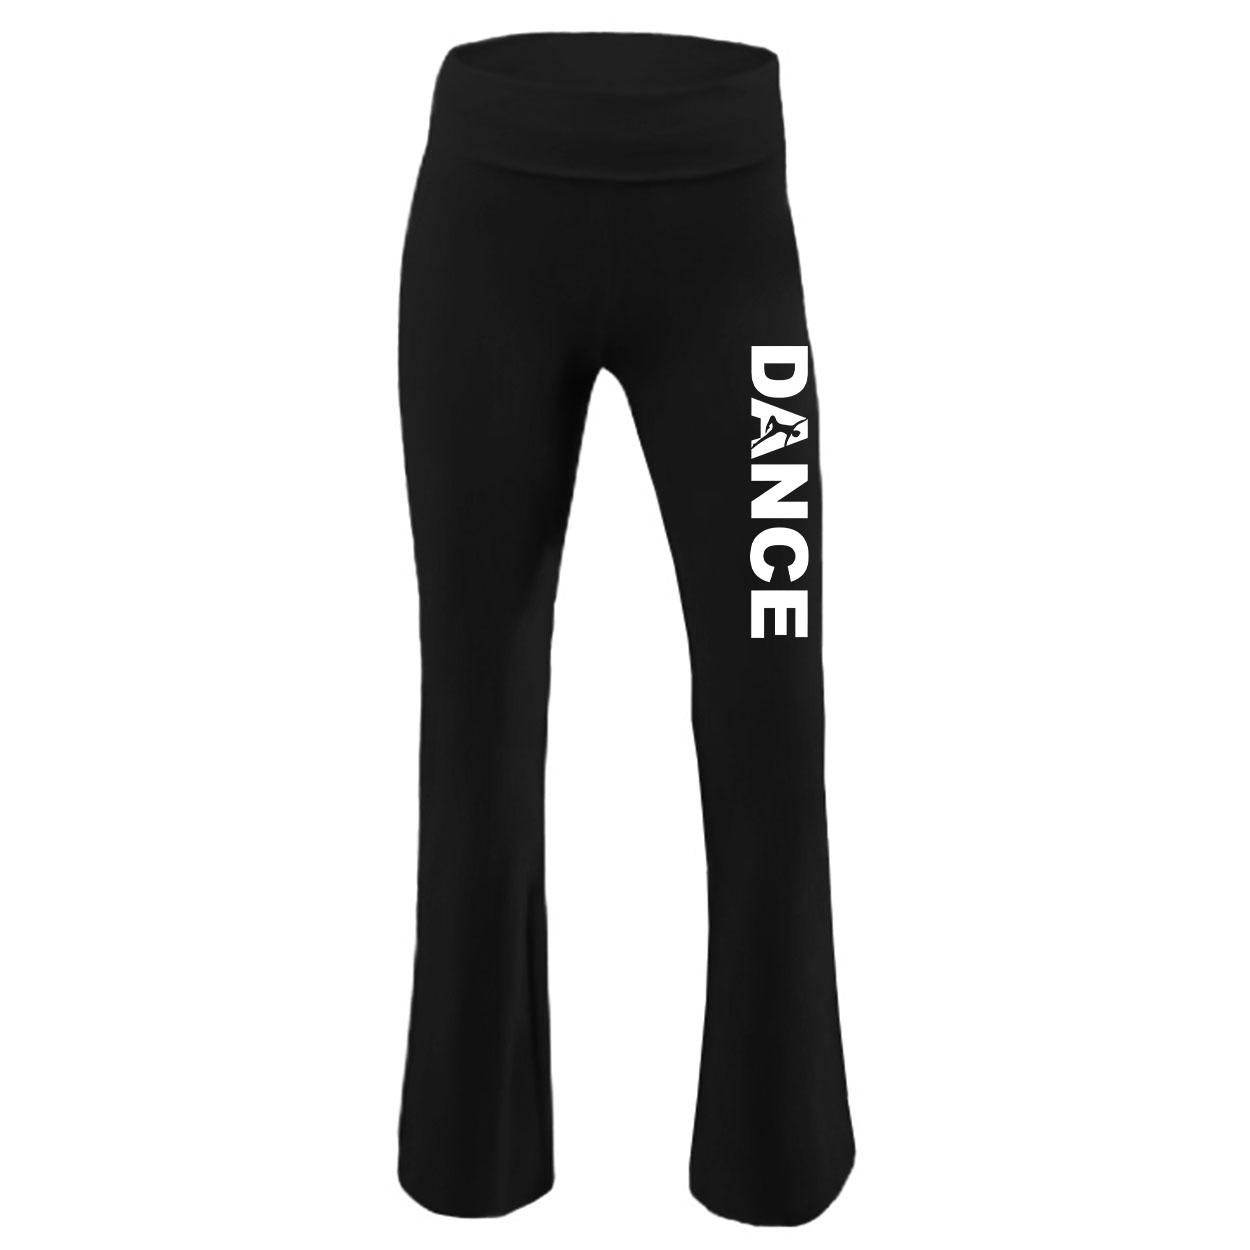 Dance Silhouette Logo Classic Youth Girls Yoga Pants Black (White Logo)